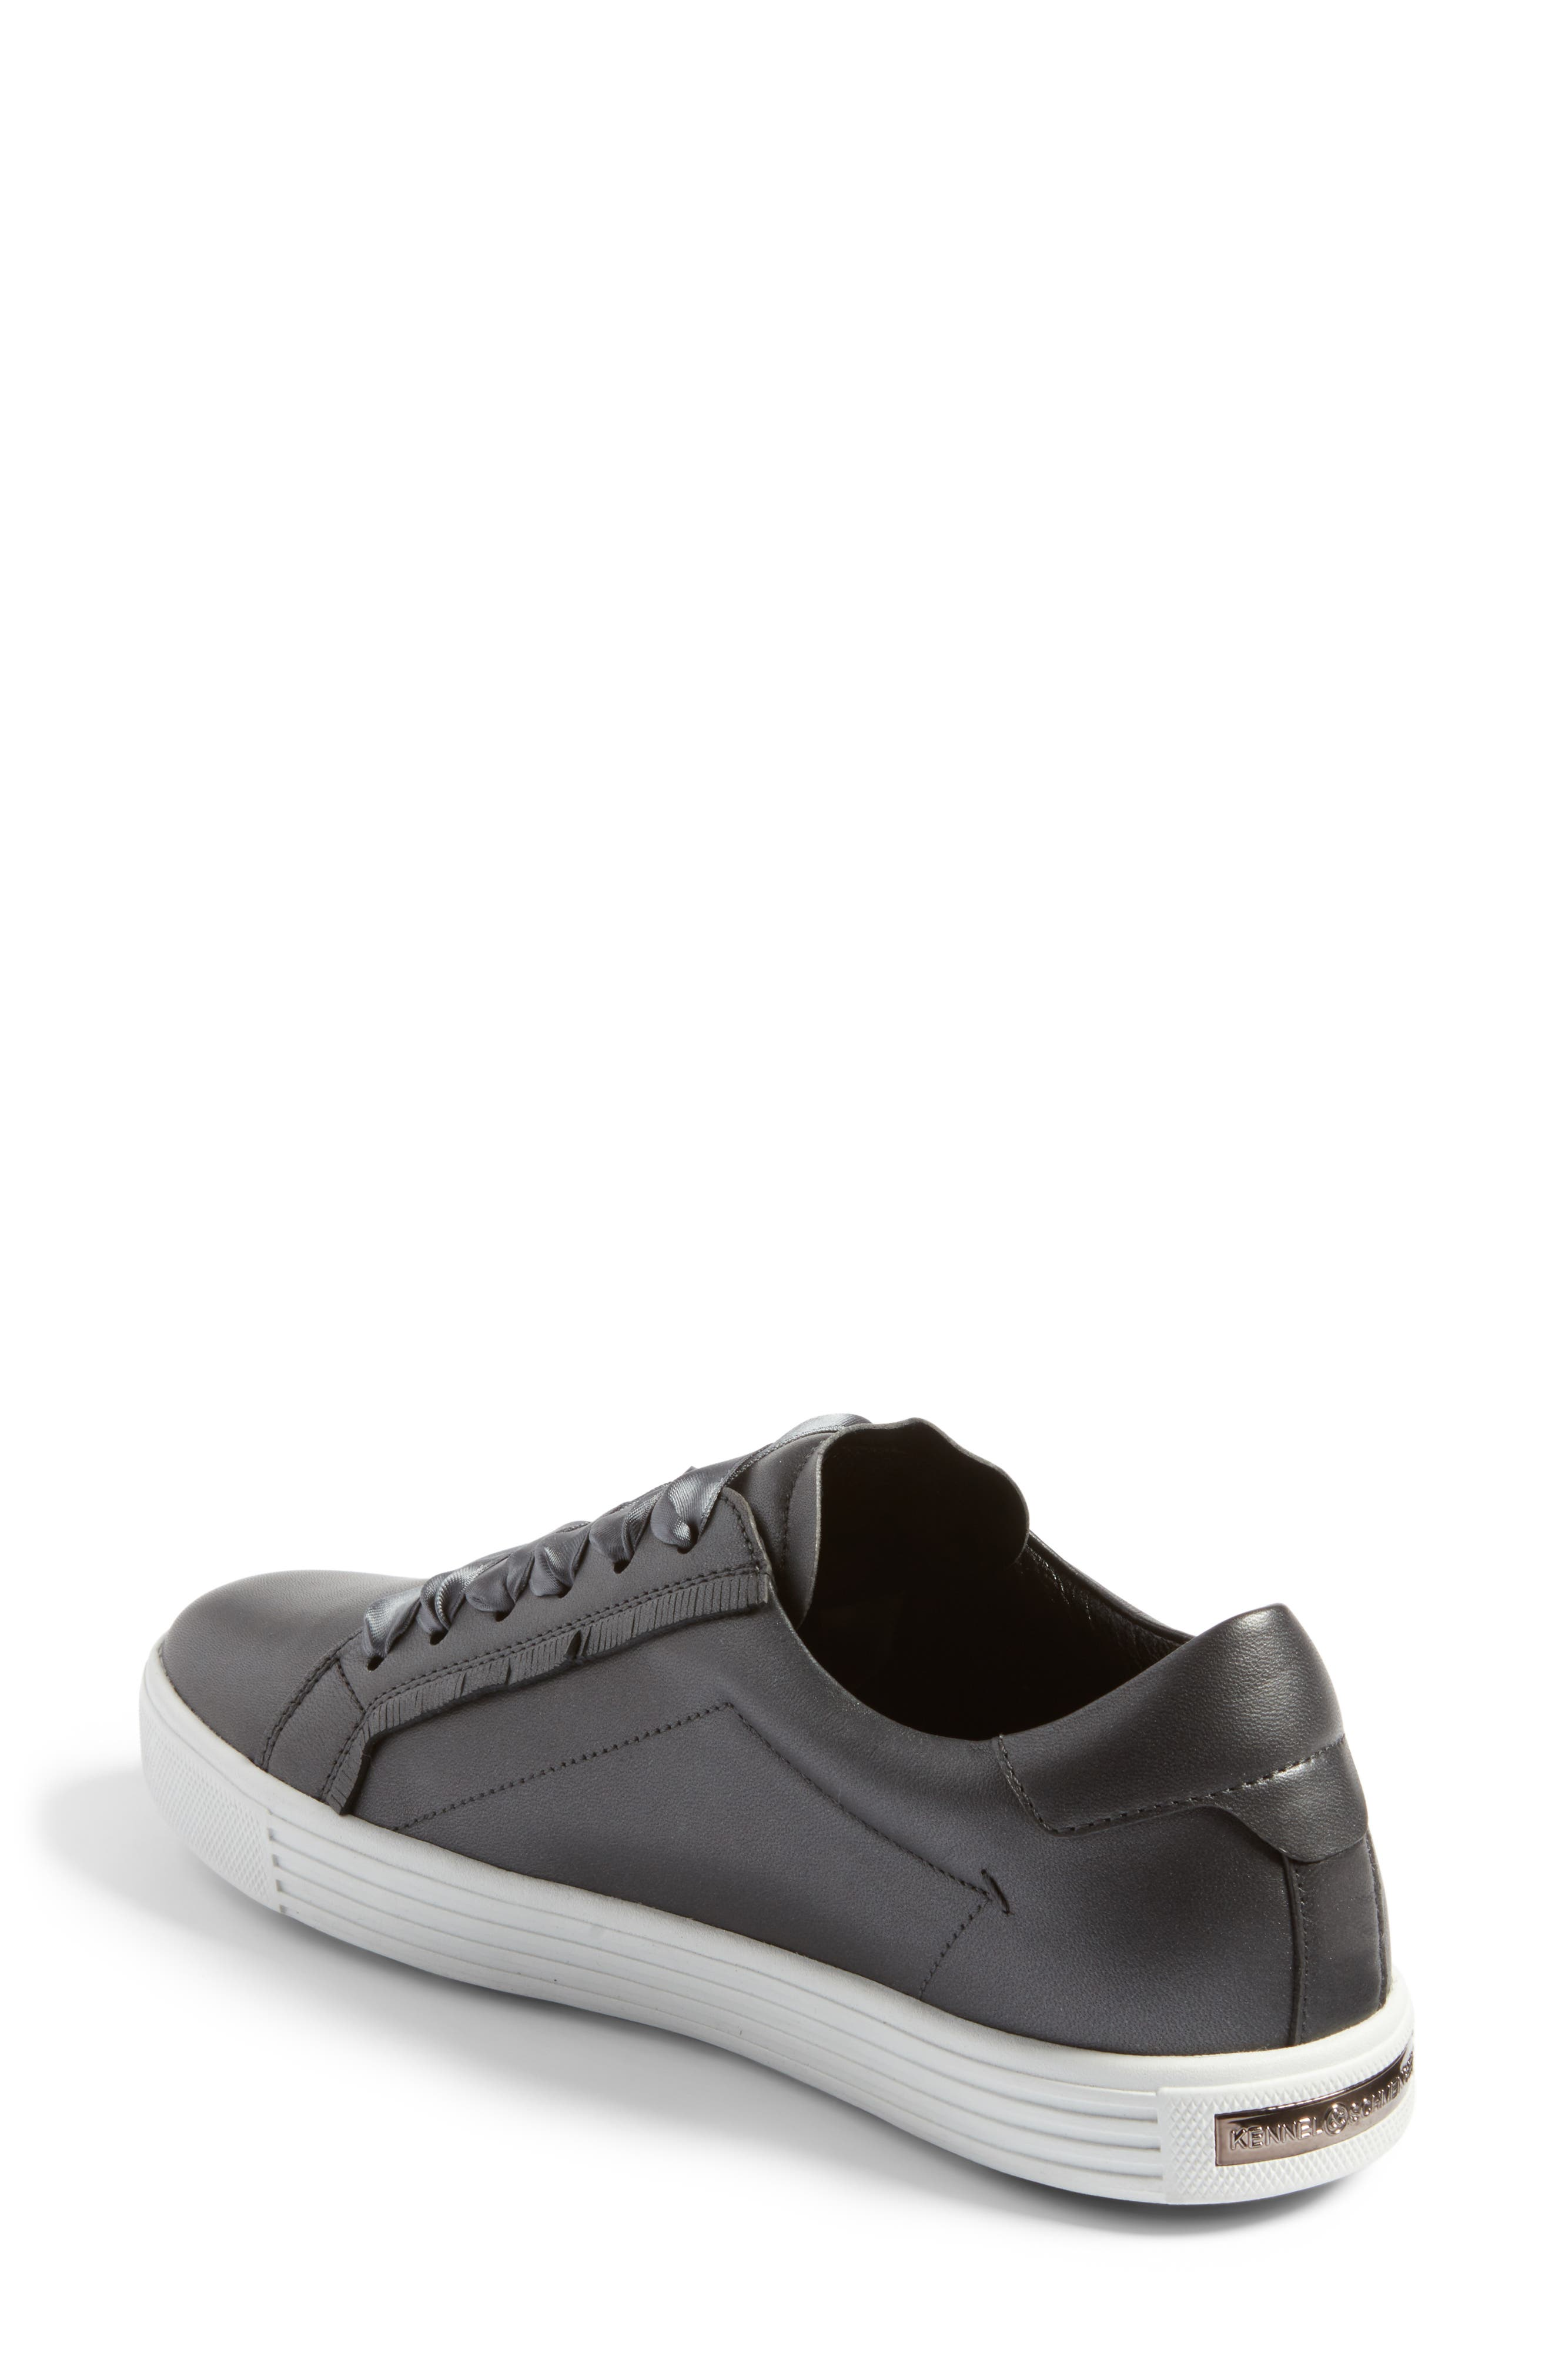 KENNEL AND SCHMENGER,                             Kennel & Schmenger Town Sneaker,                             Alternate thumbnail 2, color,                             020